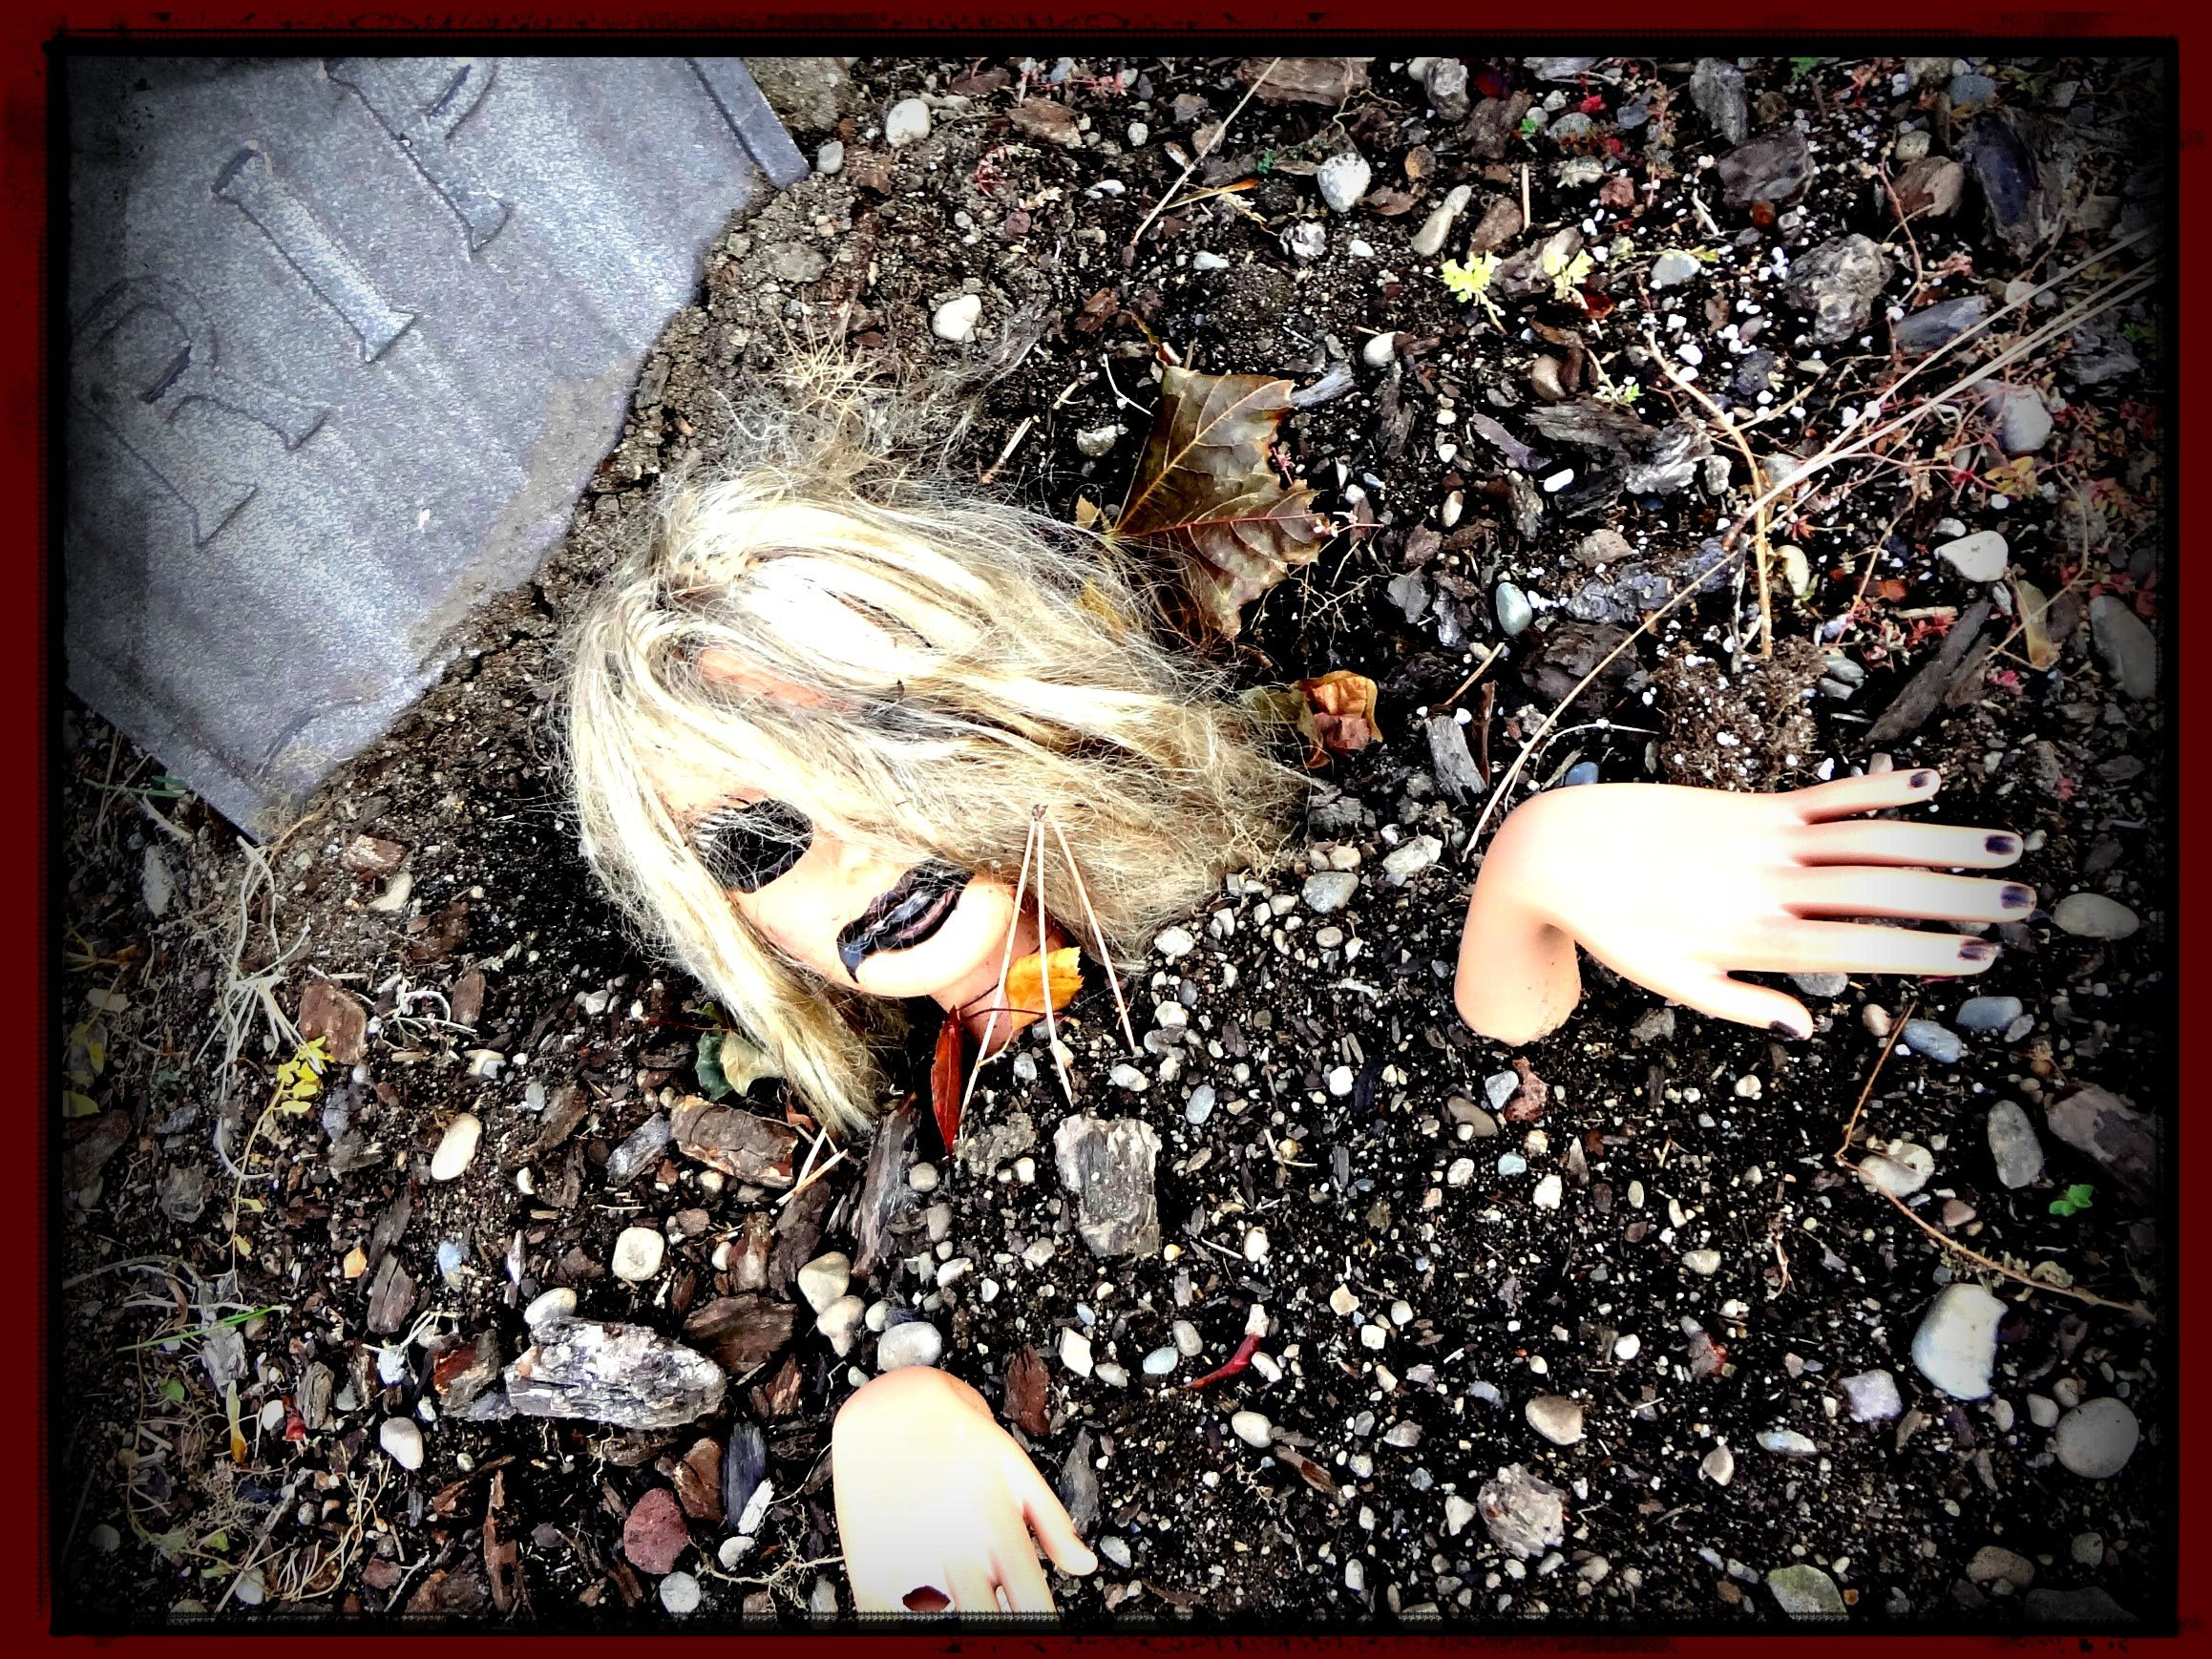 scary-halloween-yard-decorations